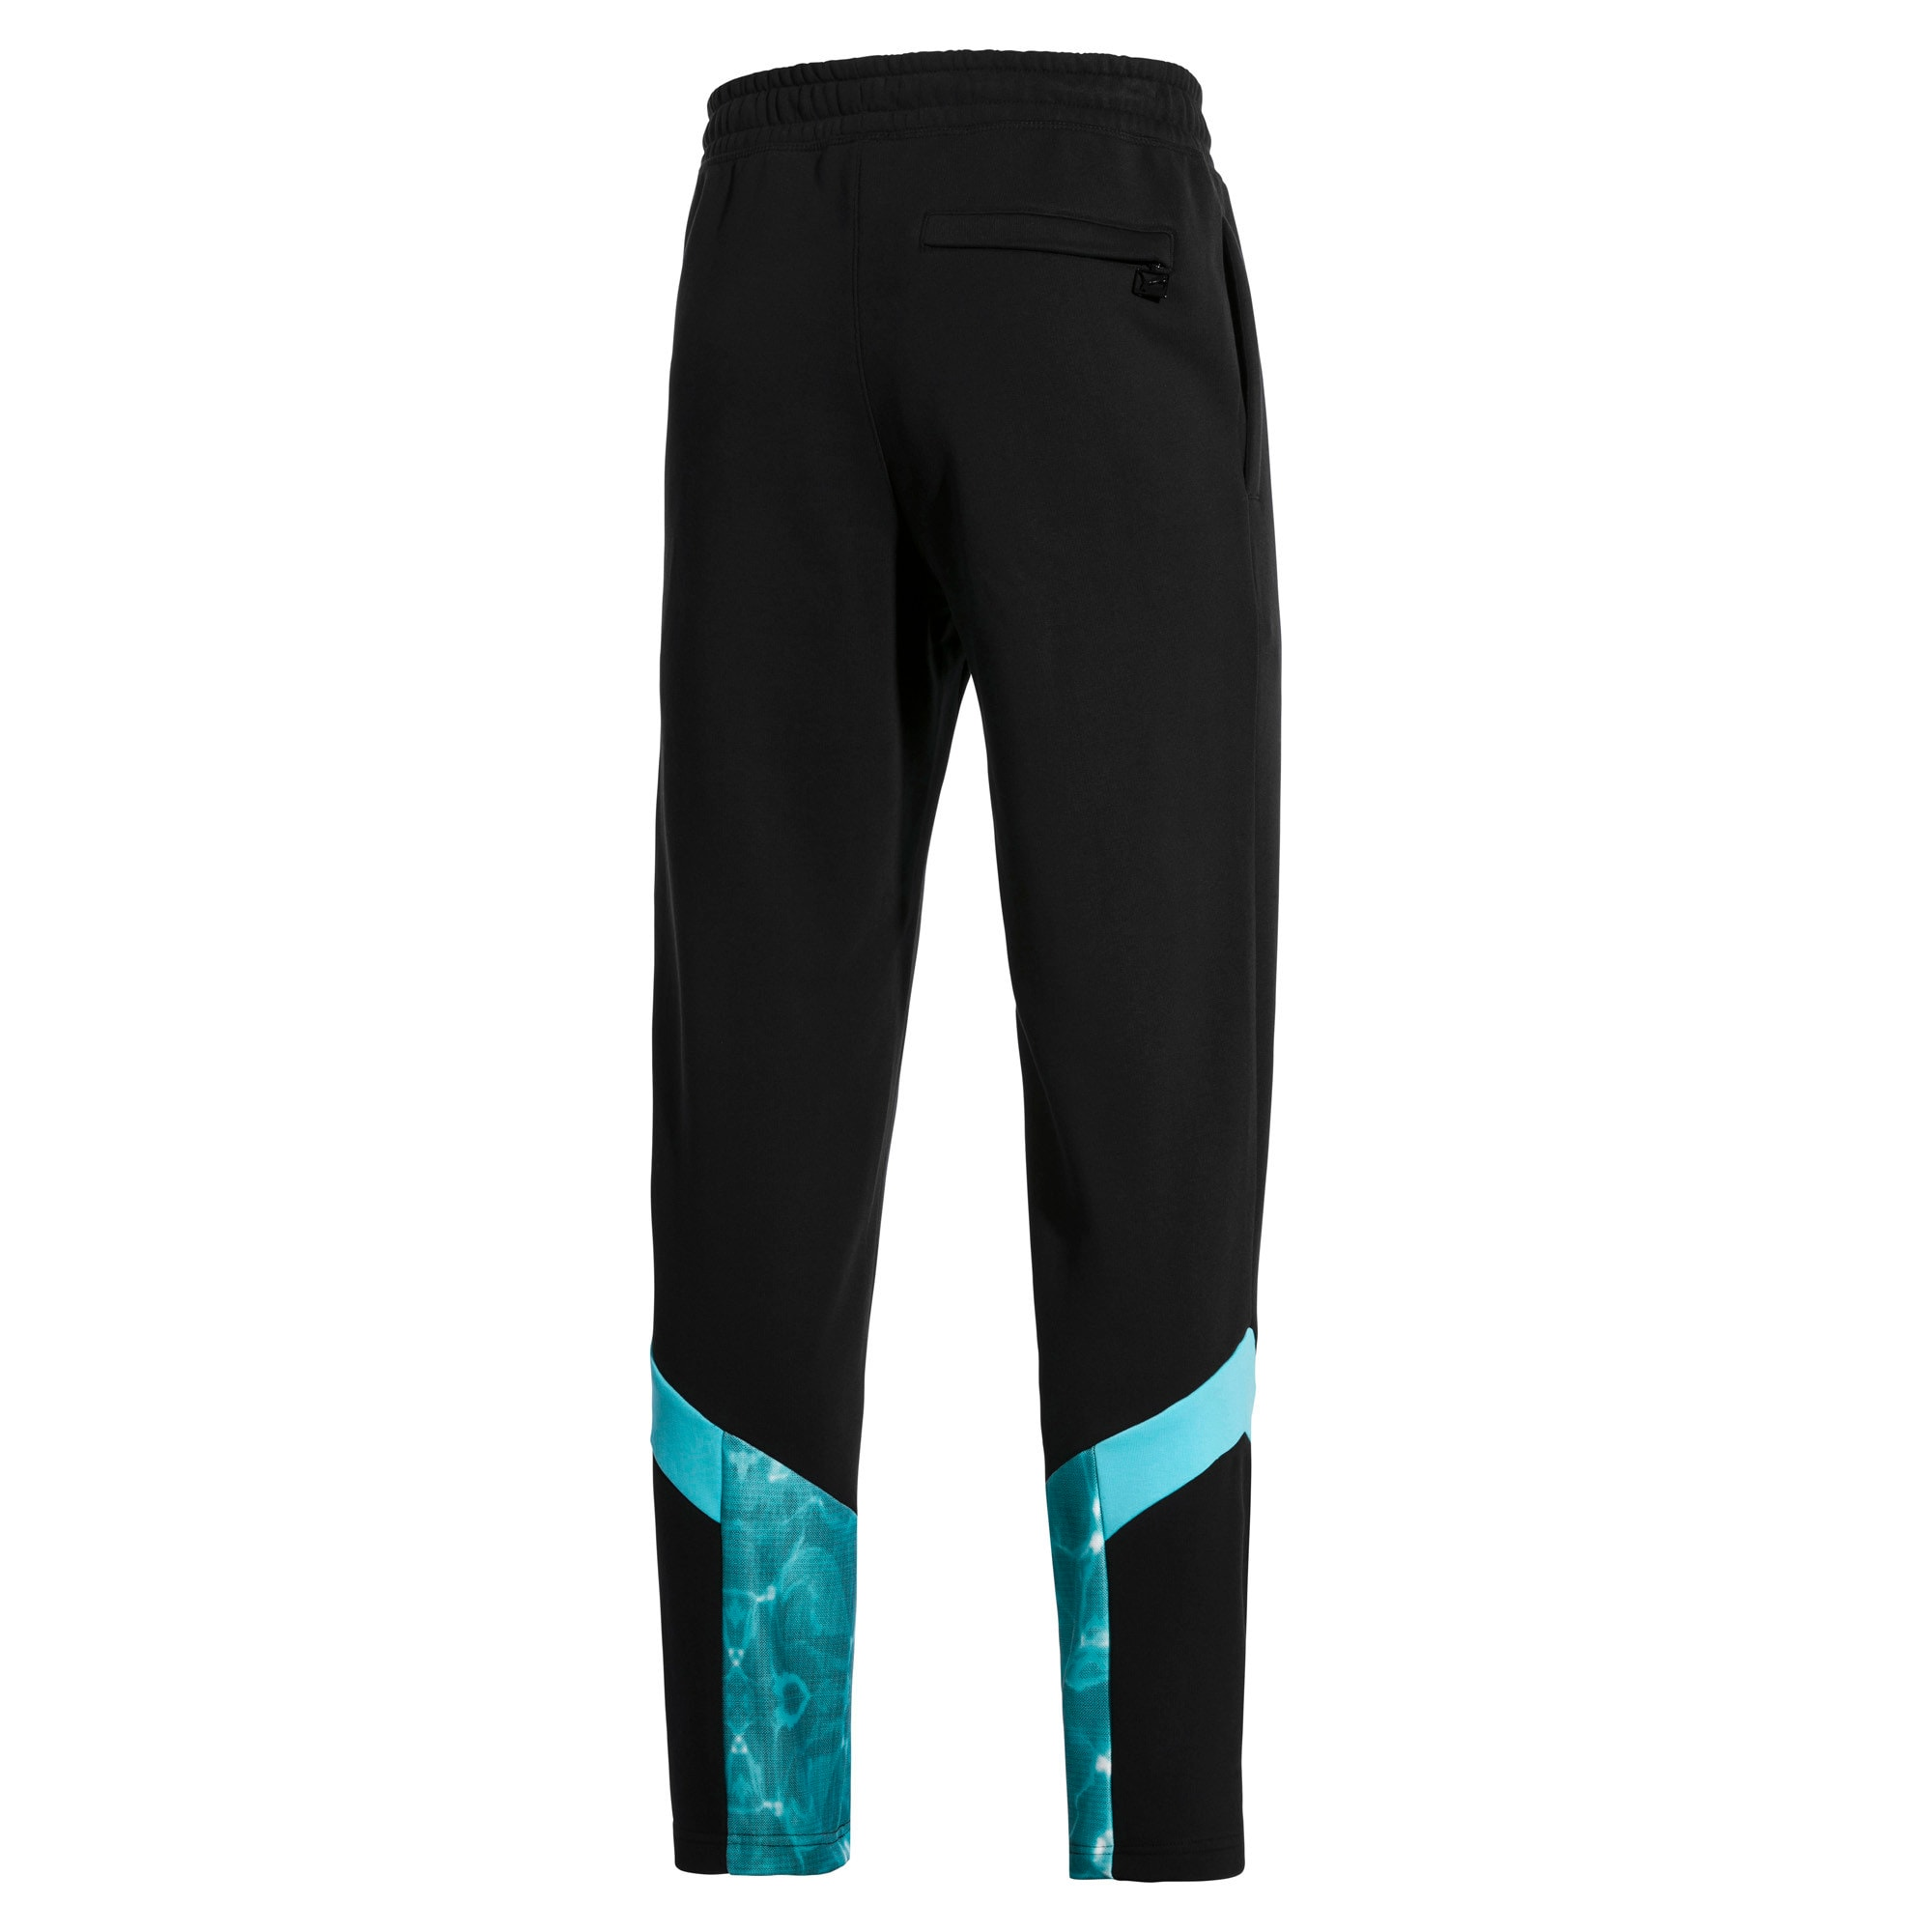 Thumbnail 3 of MCS Pool Men's Track Pants, Puma Black, medium